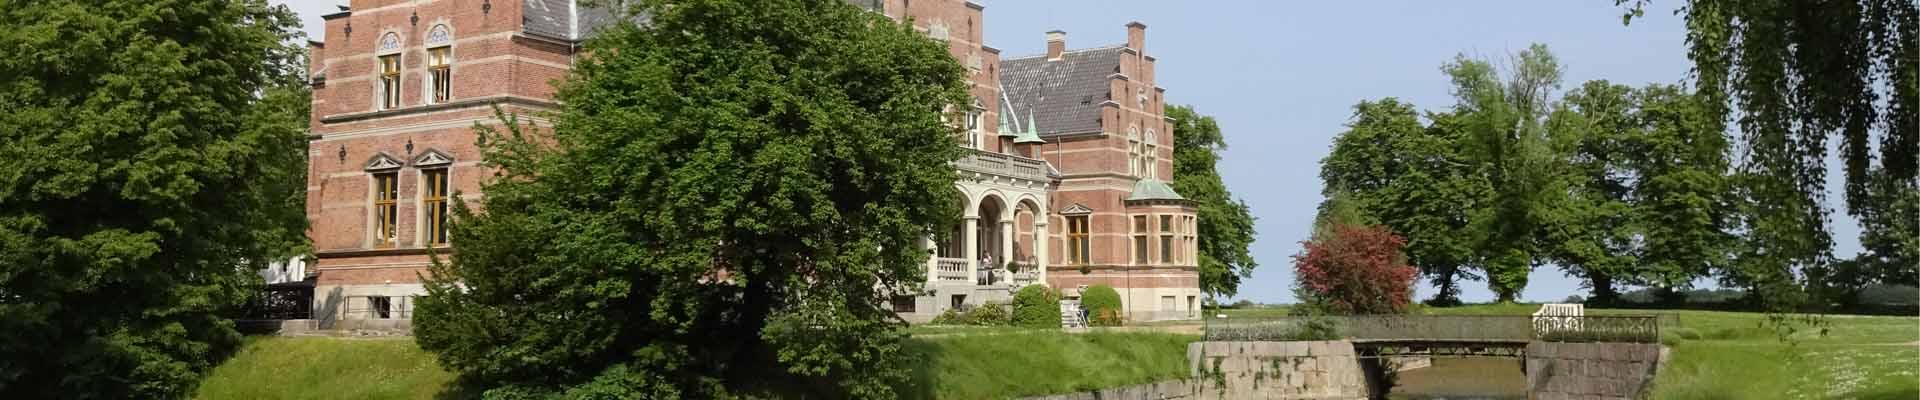 Dänemarktour - Rodbyhavn-Nykobing